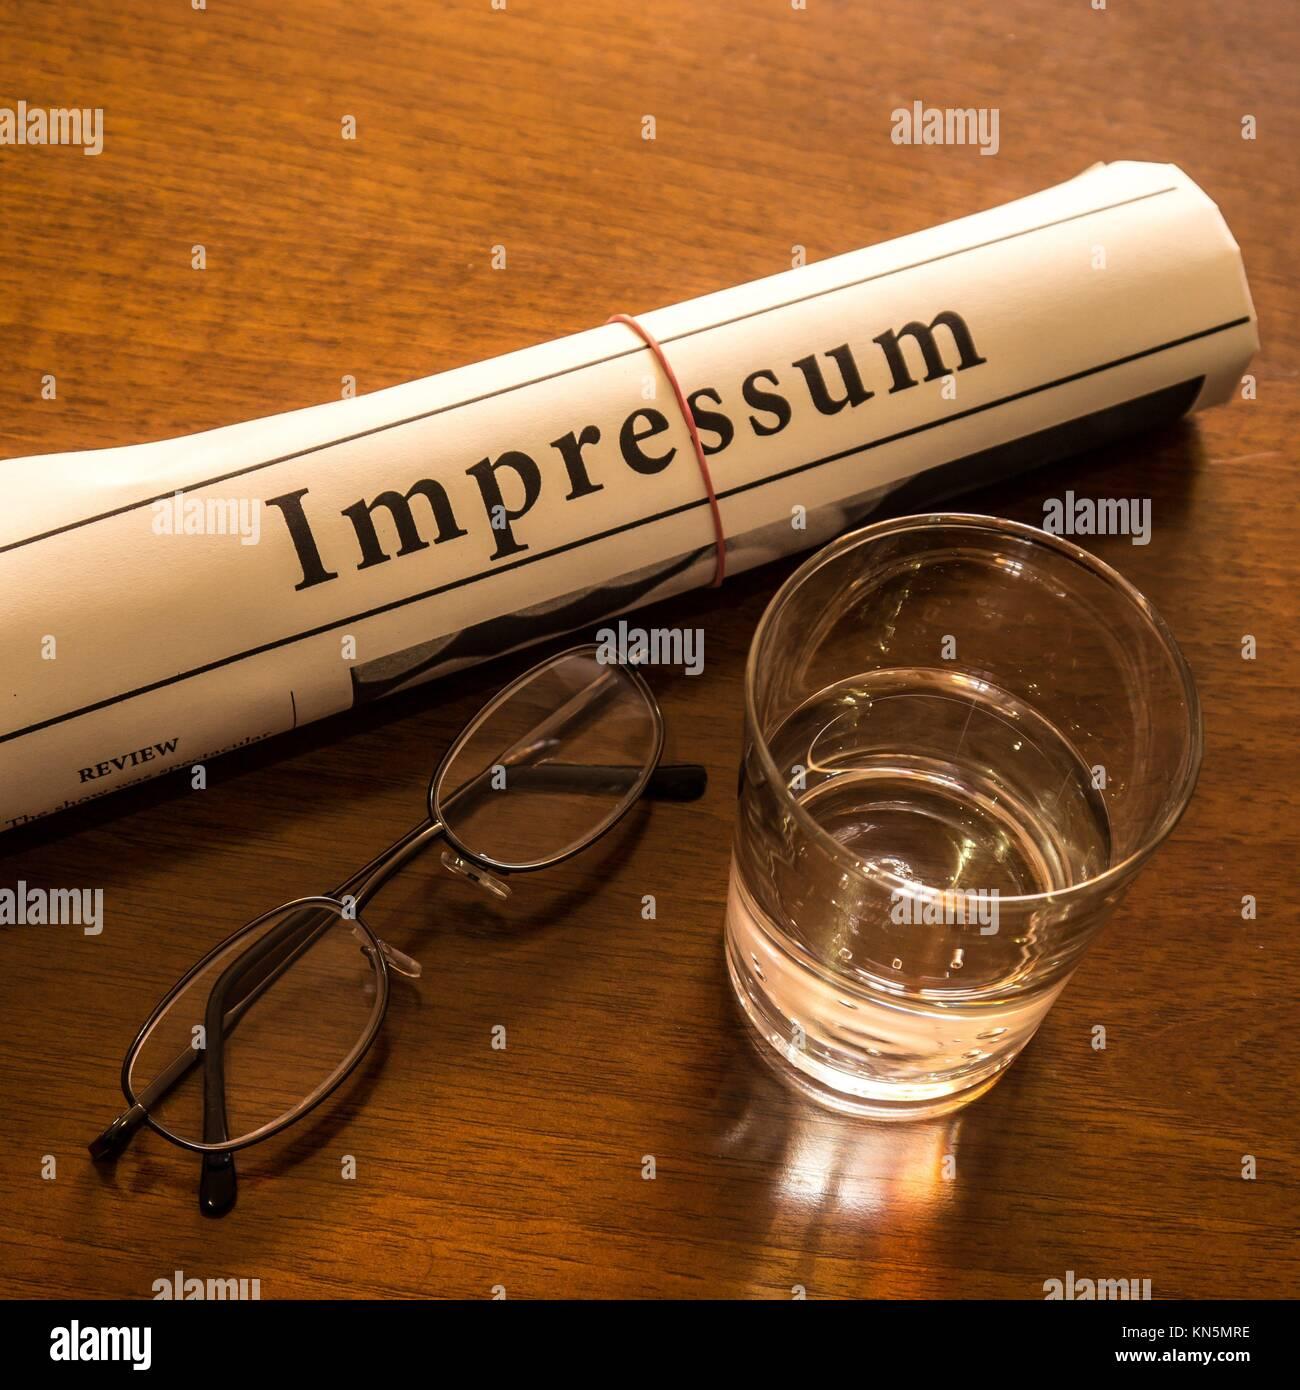 impressum, glass water, glasses on desk. - Stock Image